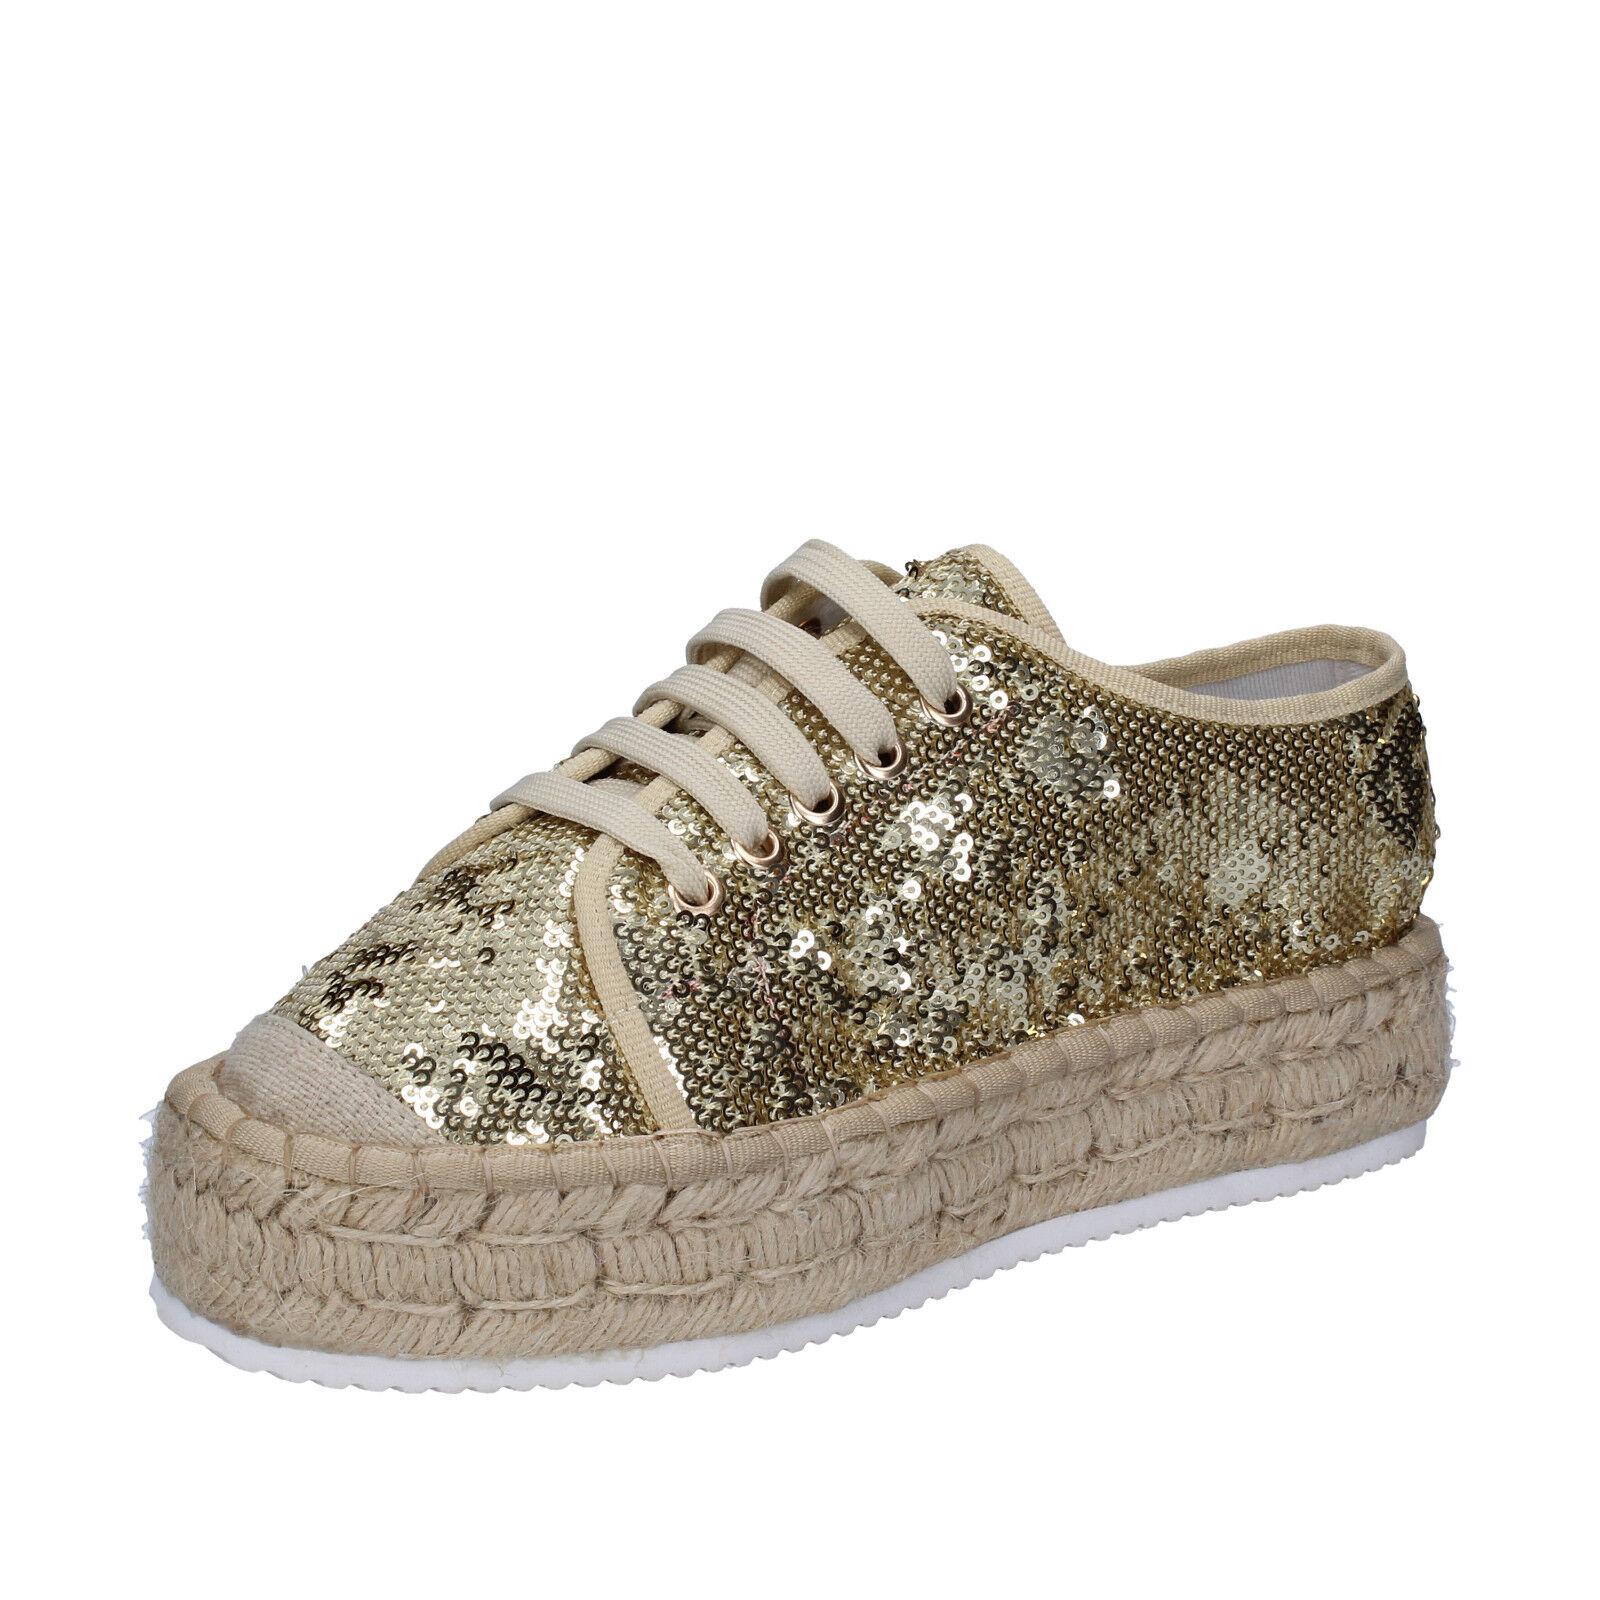 Zapatos señora francesco Milano 41 UE espadrillas platino pailettes bs77-41